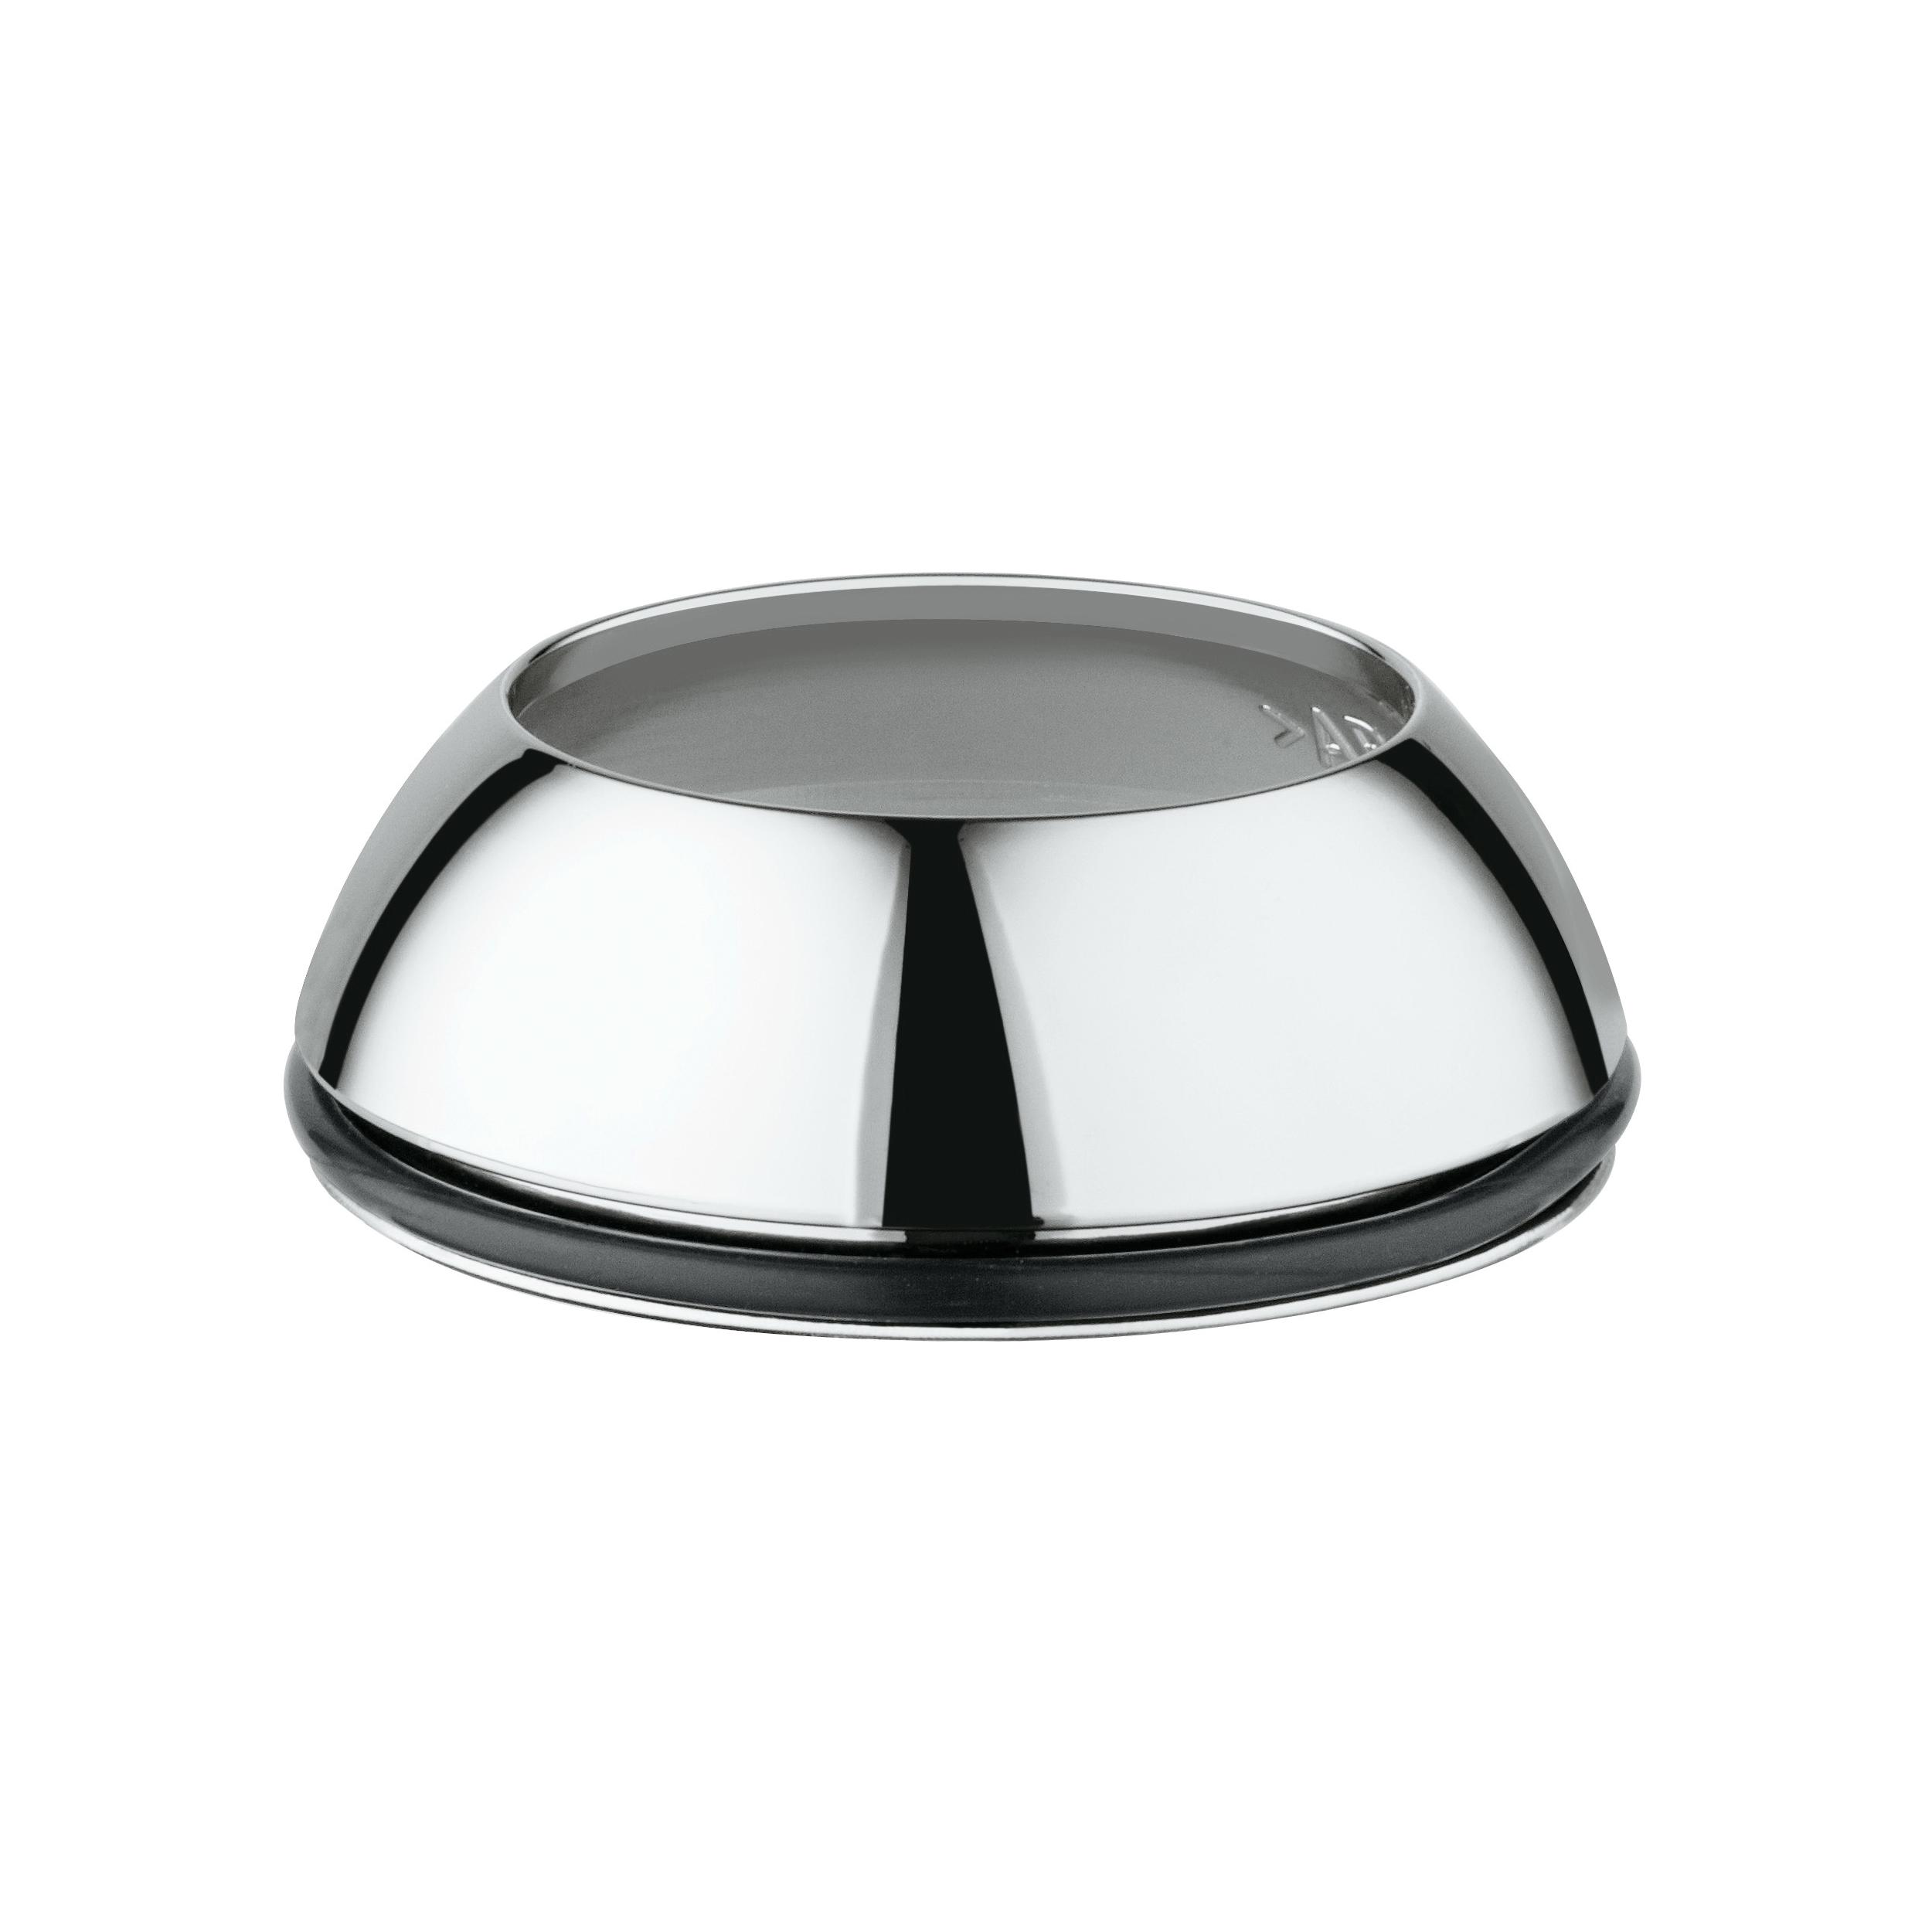 GROHE 46116000 Cap, StarLight® Chrome, Import